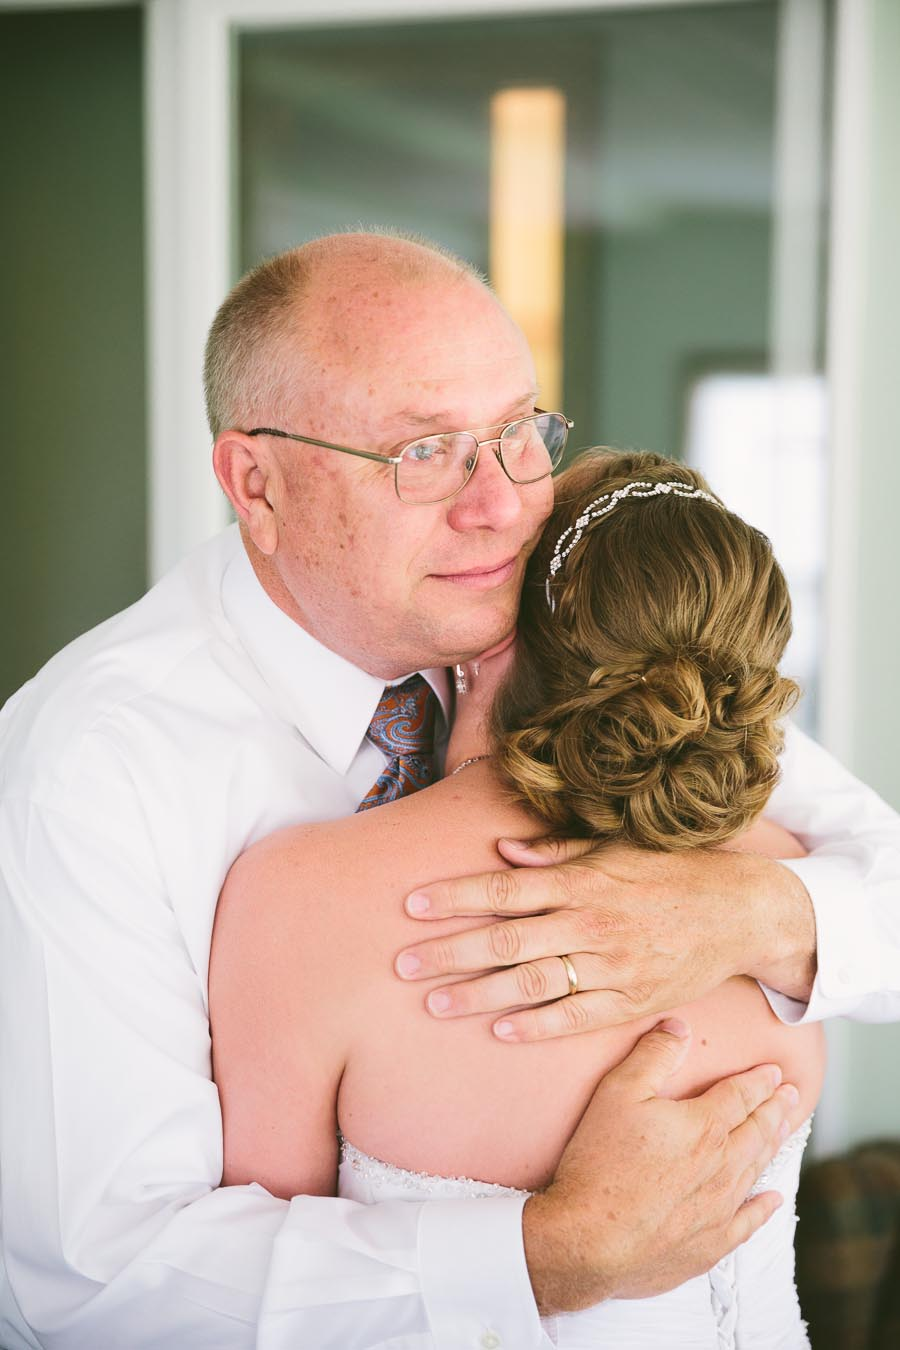 columbus-delaware-ohio-wedding-photography-all-occasions-60.jpg